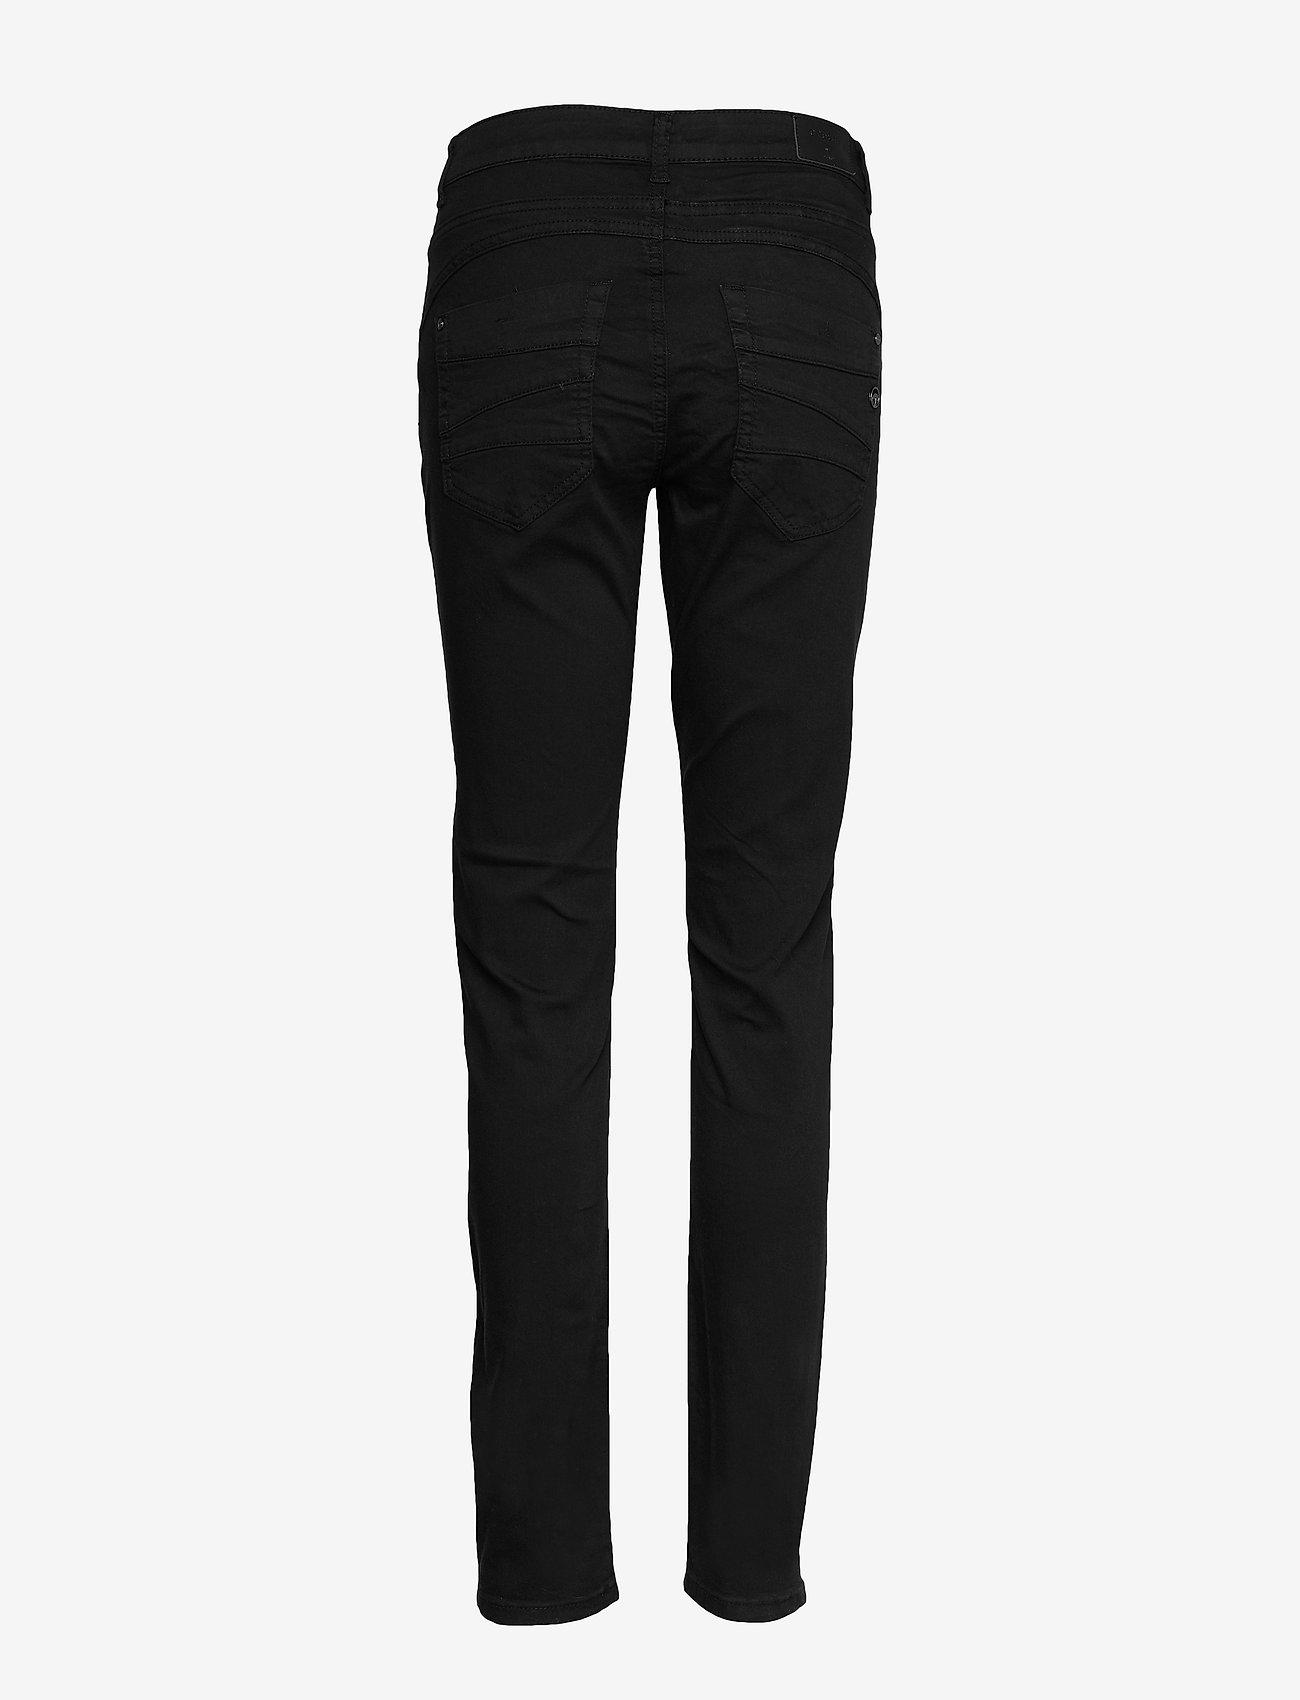 Cream - LotteCR Plain Twill - Coco Fit - skinny jeans - pitch black - 1